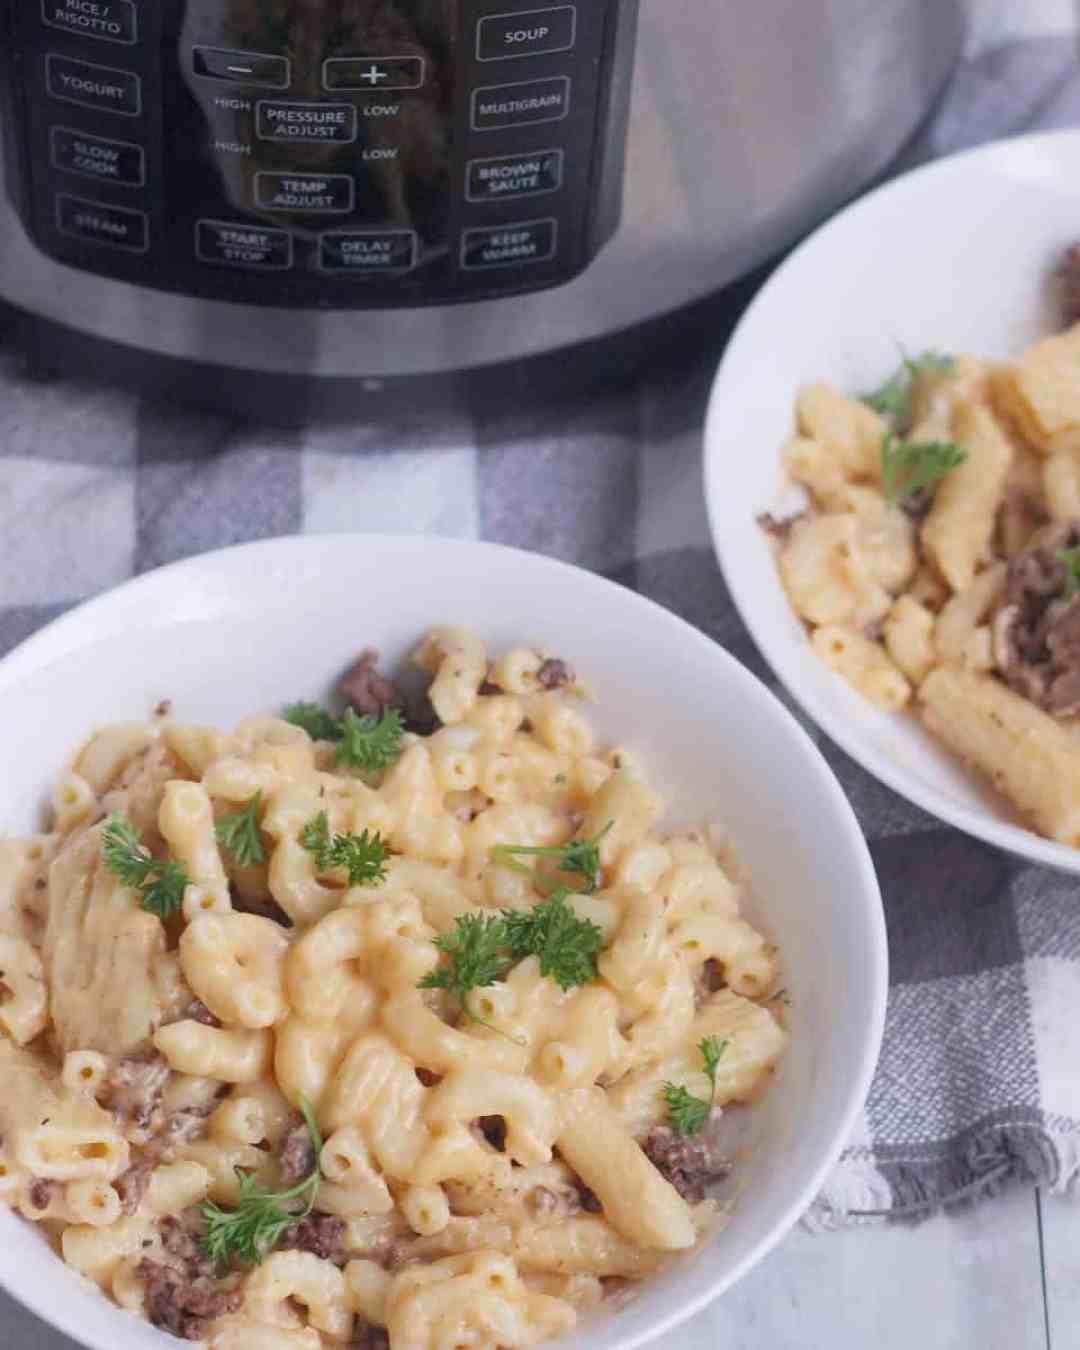 Crock Pot Express Crock Multi Cooker Oxtail Mac And Cheese Evs Eats